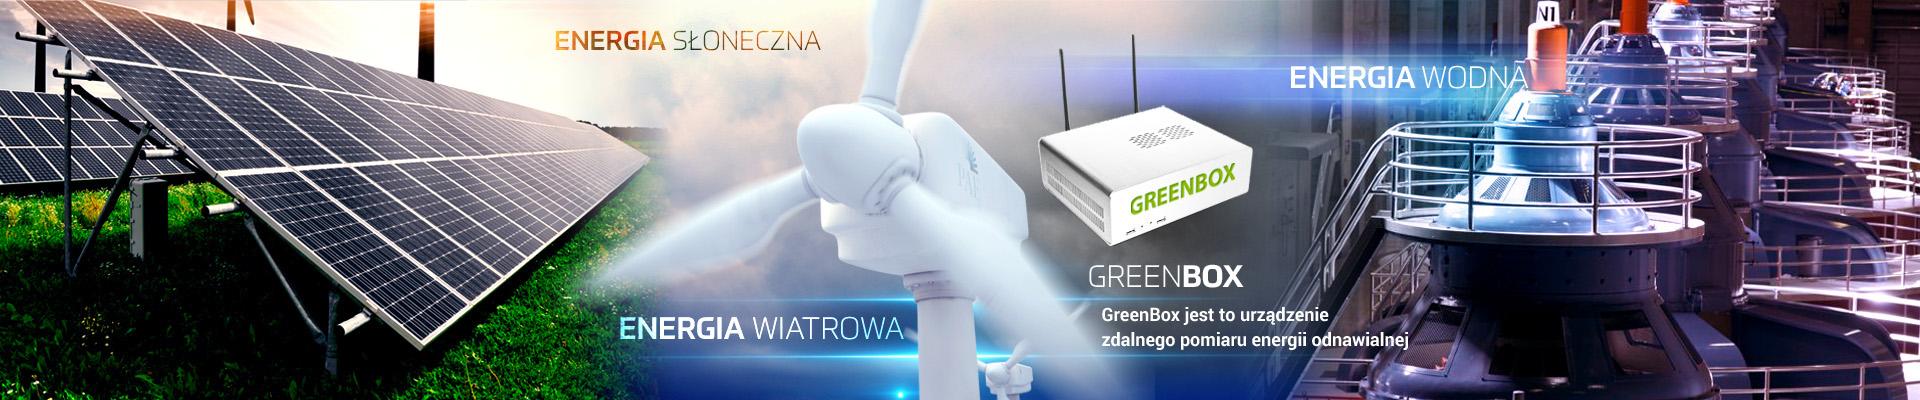 Solarny licznik-miernik energi zielonej